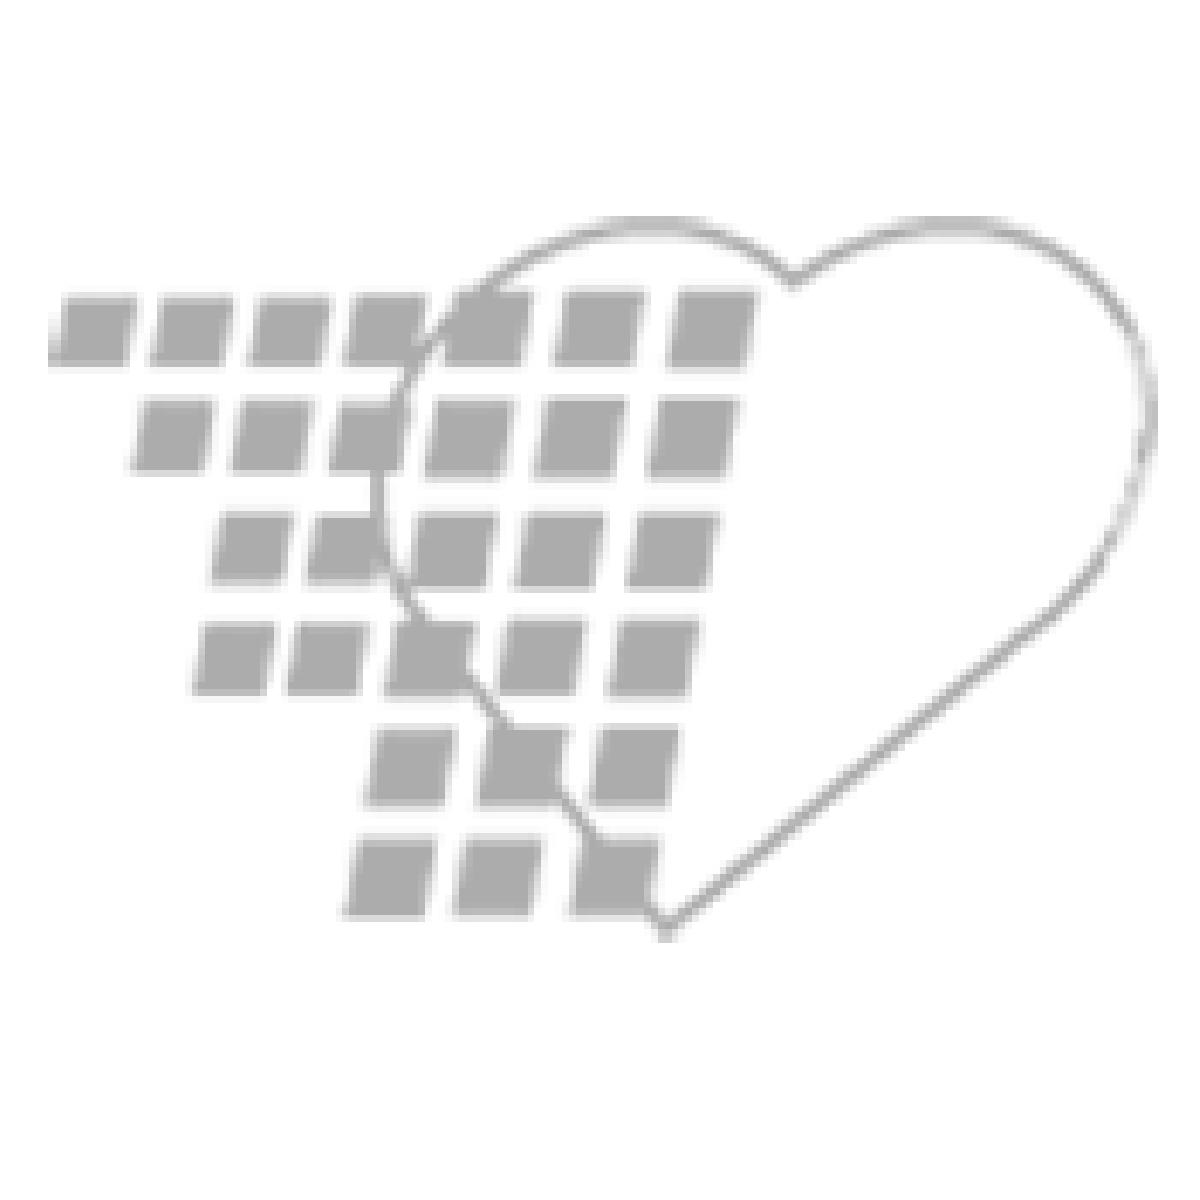 09-31-9598 Anatomy of the Heart Chart